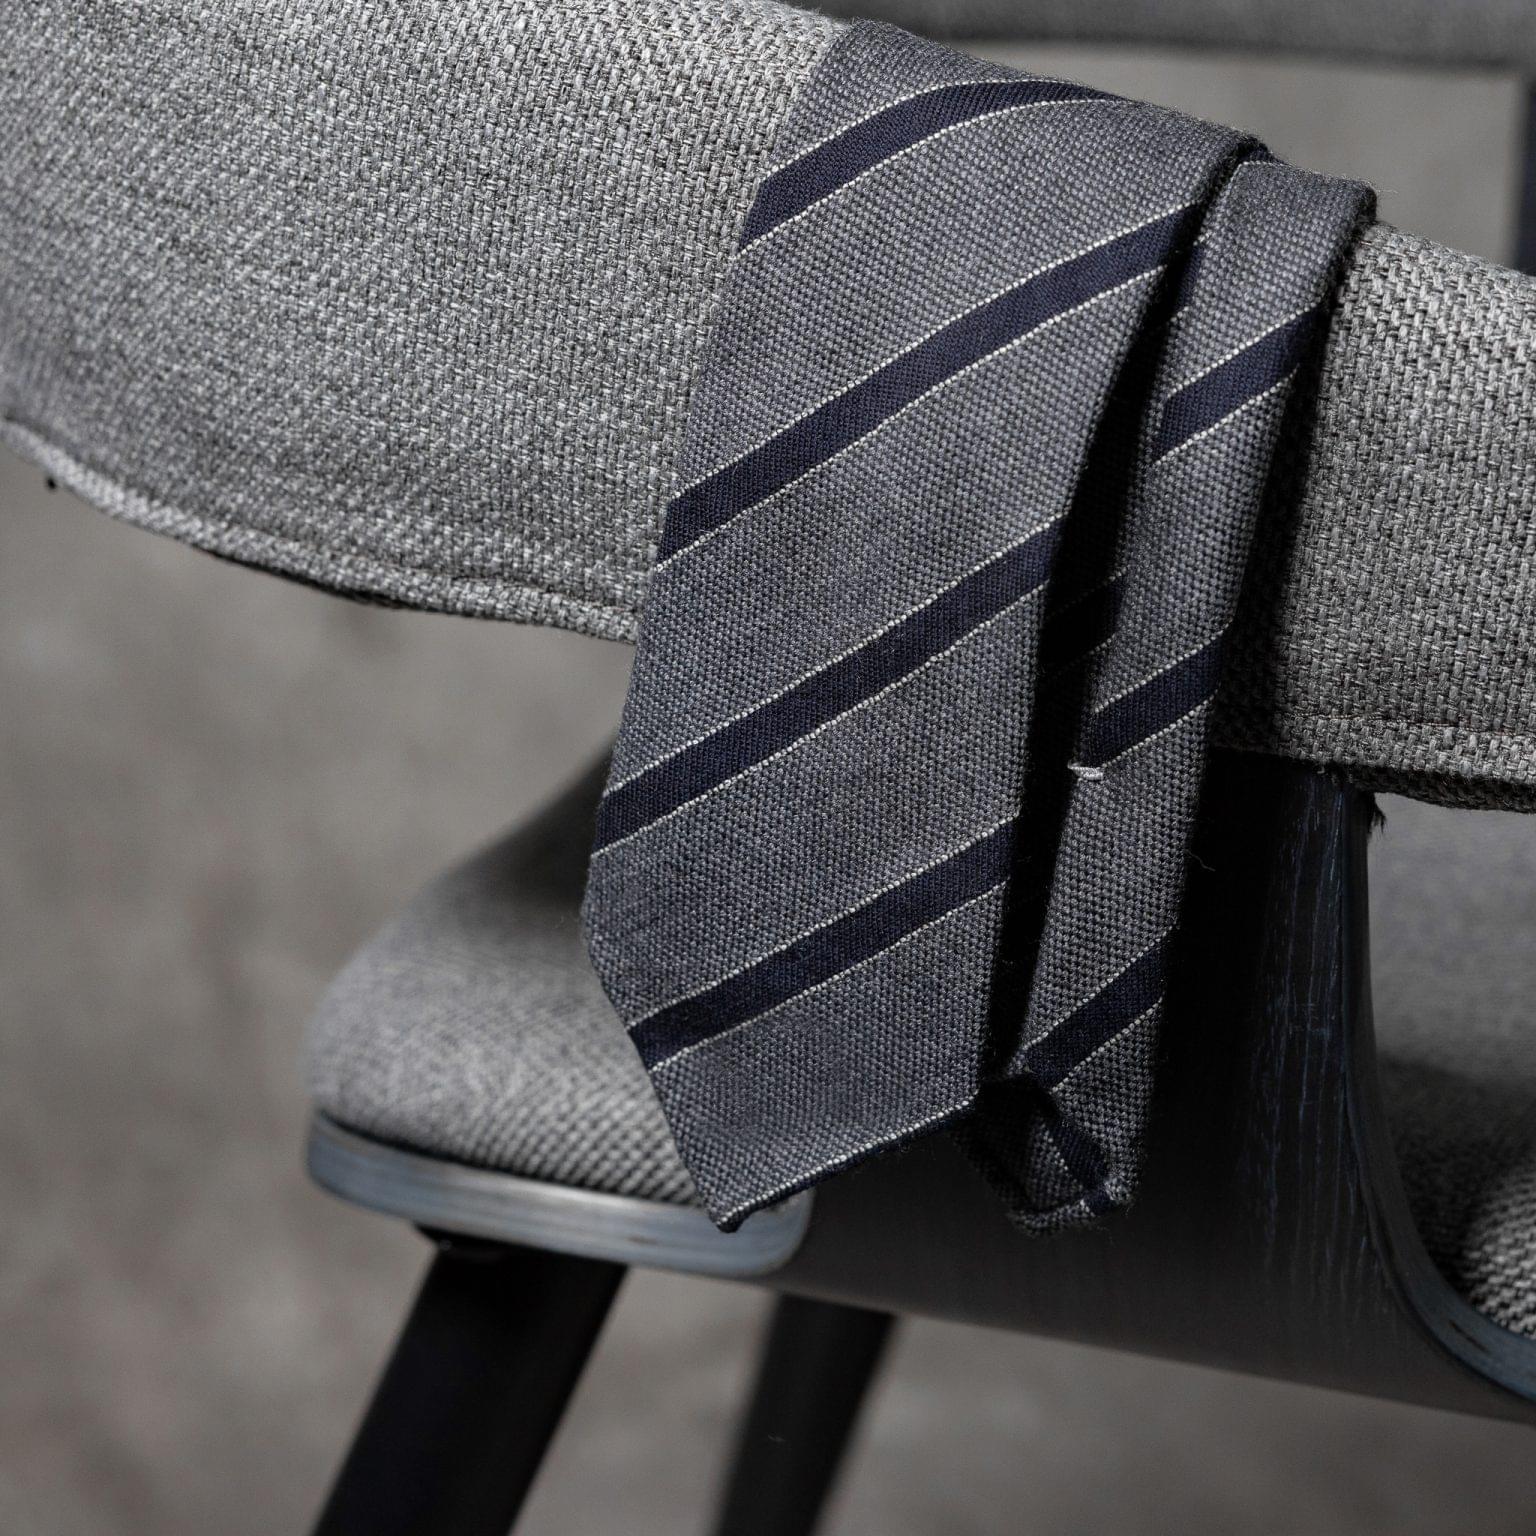 WOOL-LANA-0513-Tie-Initials-Corbata-Iniciales-The-Seelk-2